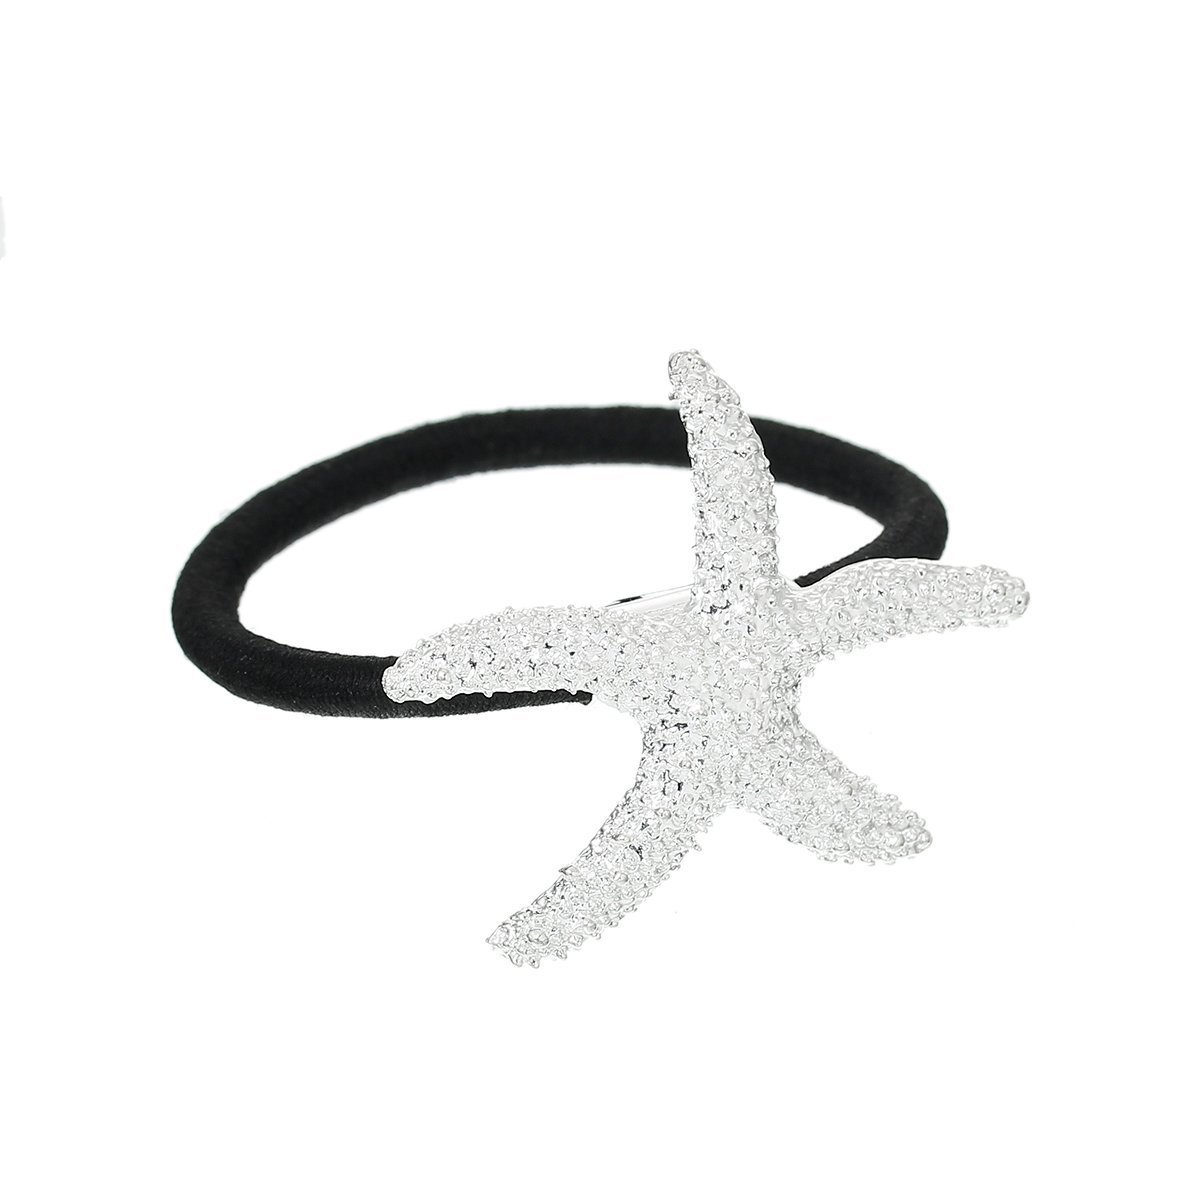 Nylon Cirlce Ring Hair Band Ponytail Holder Black Acrylic Imitation Pearl Choose Your Style From Menu (Starfish)